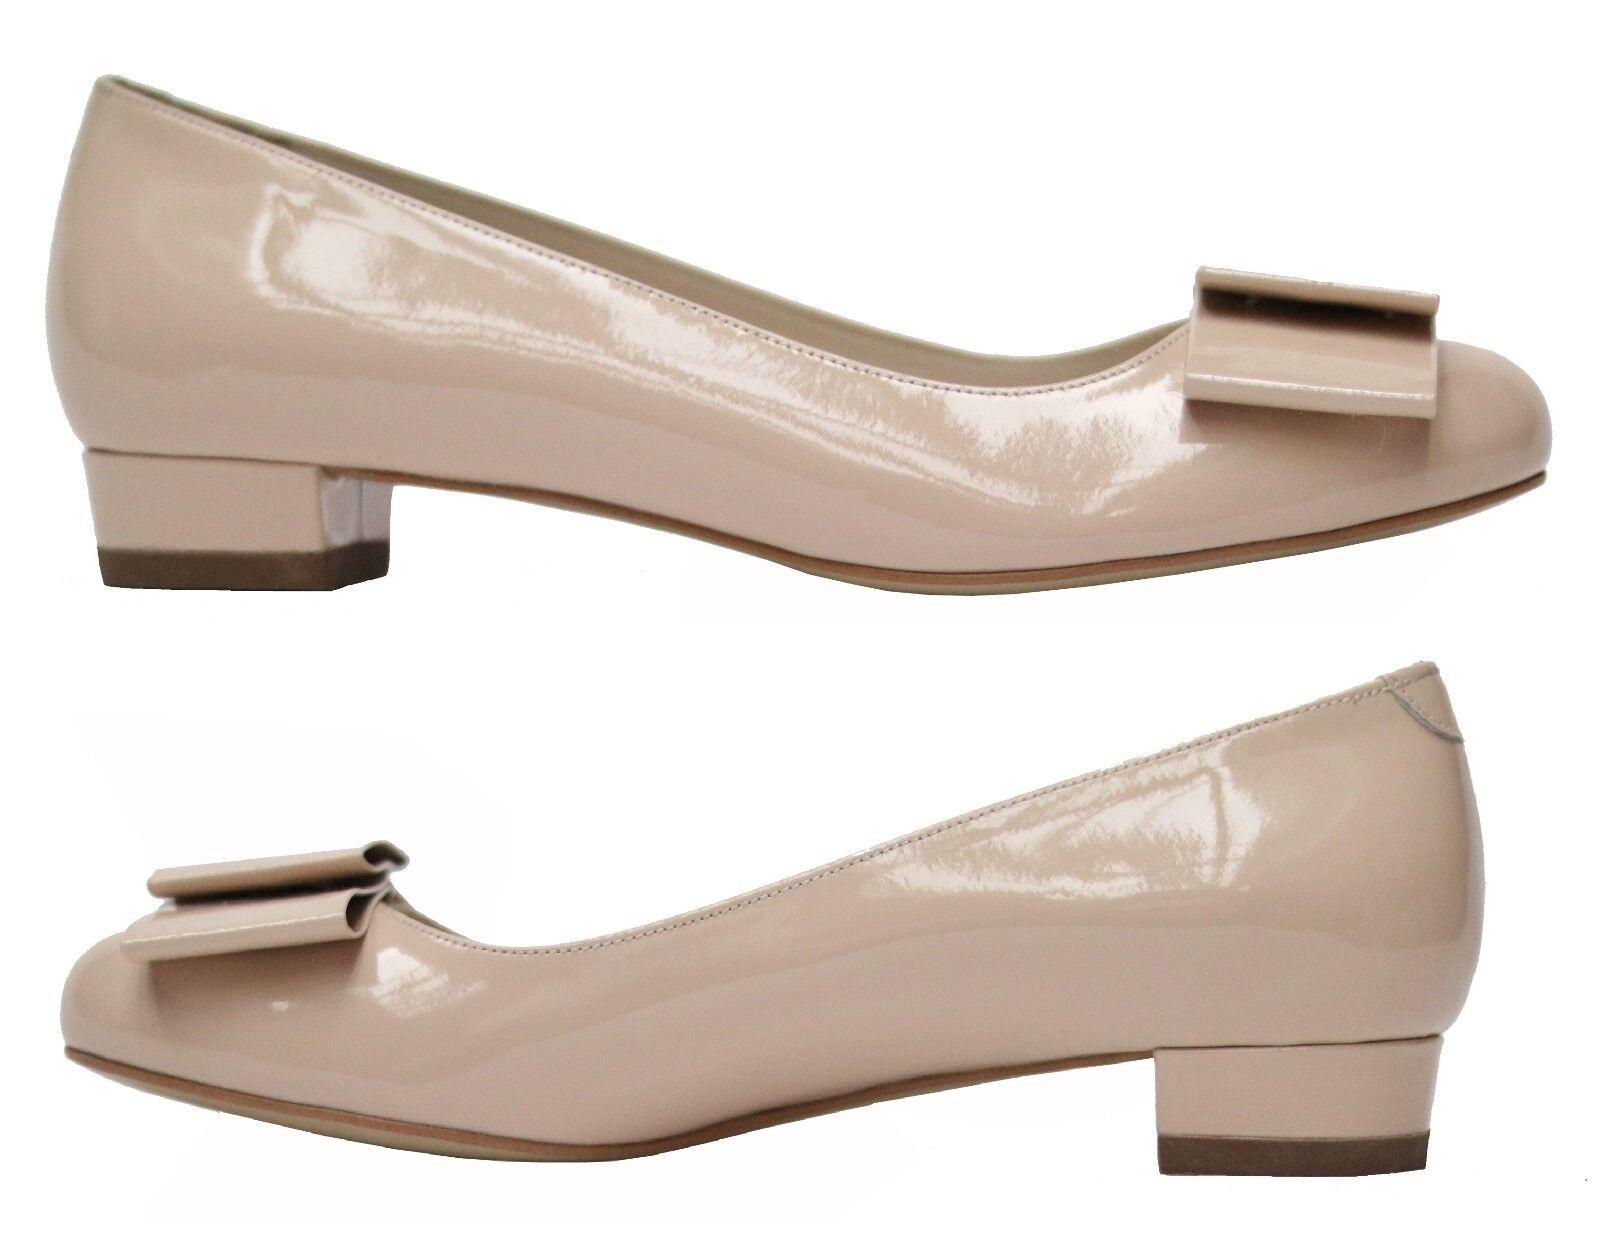 Muga Damen Schuhe Ballerina Gr.37 Beige